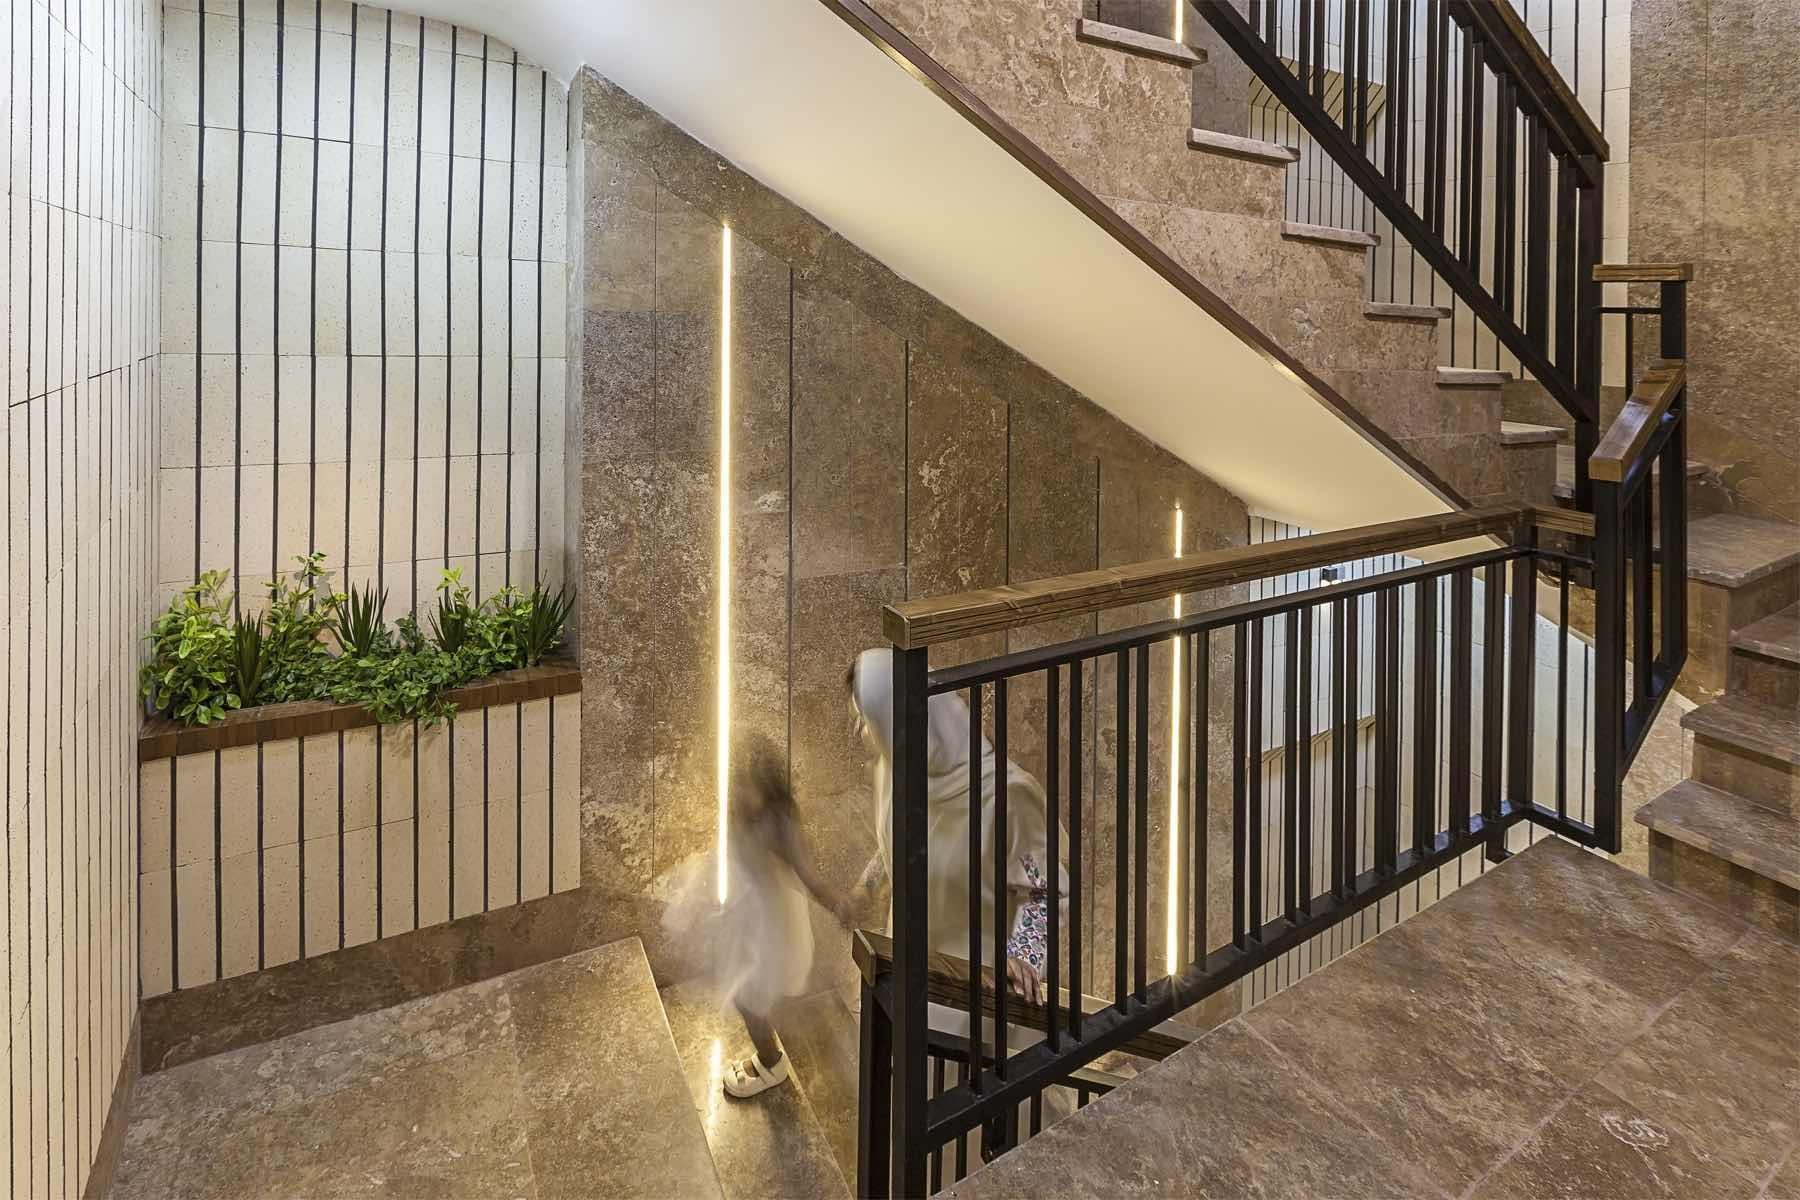 Rouzan_Residential_Building_Sayed_hamed_jafari_Charchoob_Architecture_Office_0011.jpg